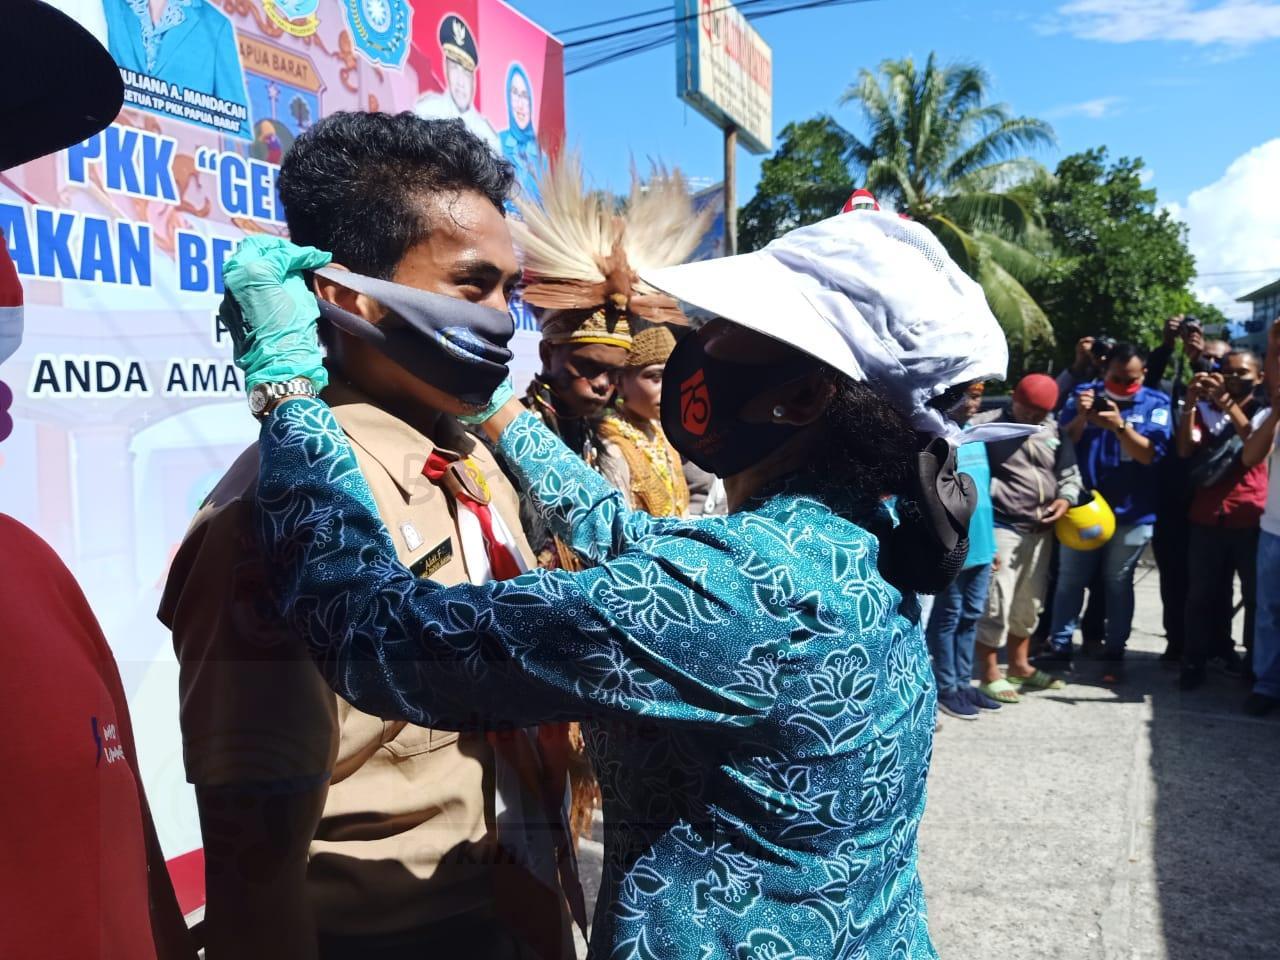 PKK Papua Barat Bagikan 10.000 Masker Kepada Pengendara di Manokwari 1 IMG 20200817 WA0163